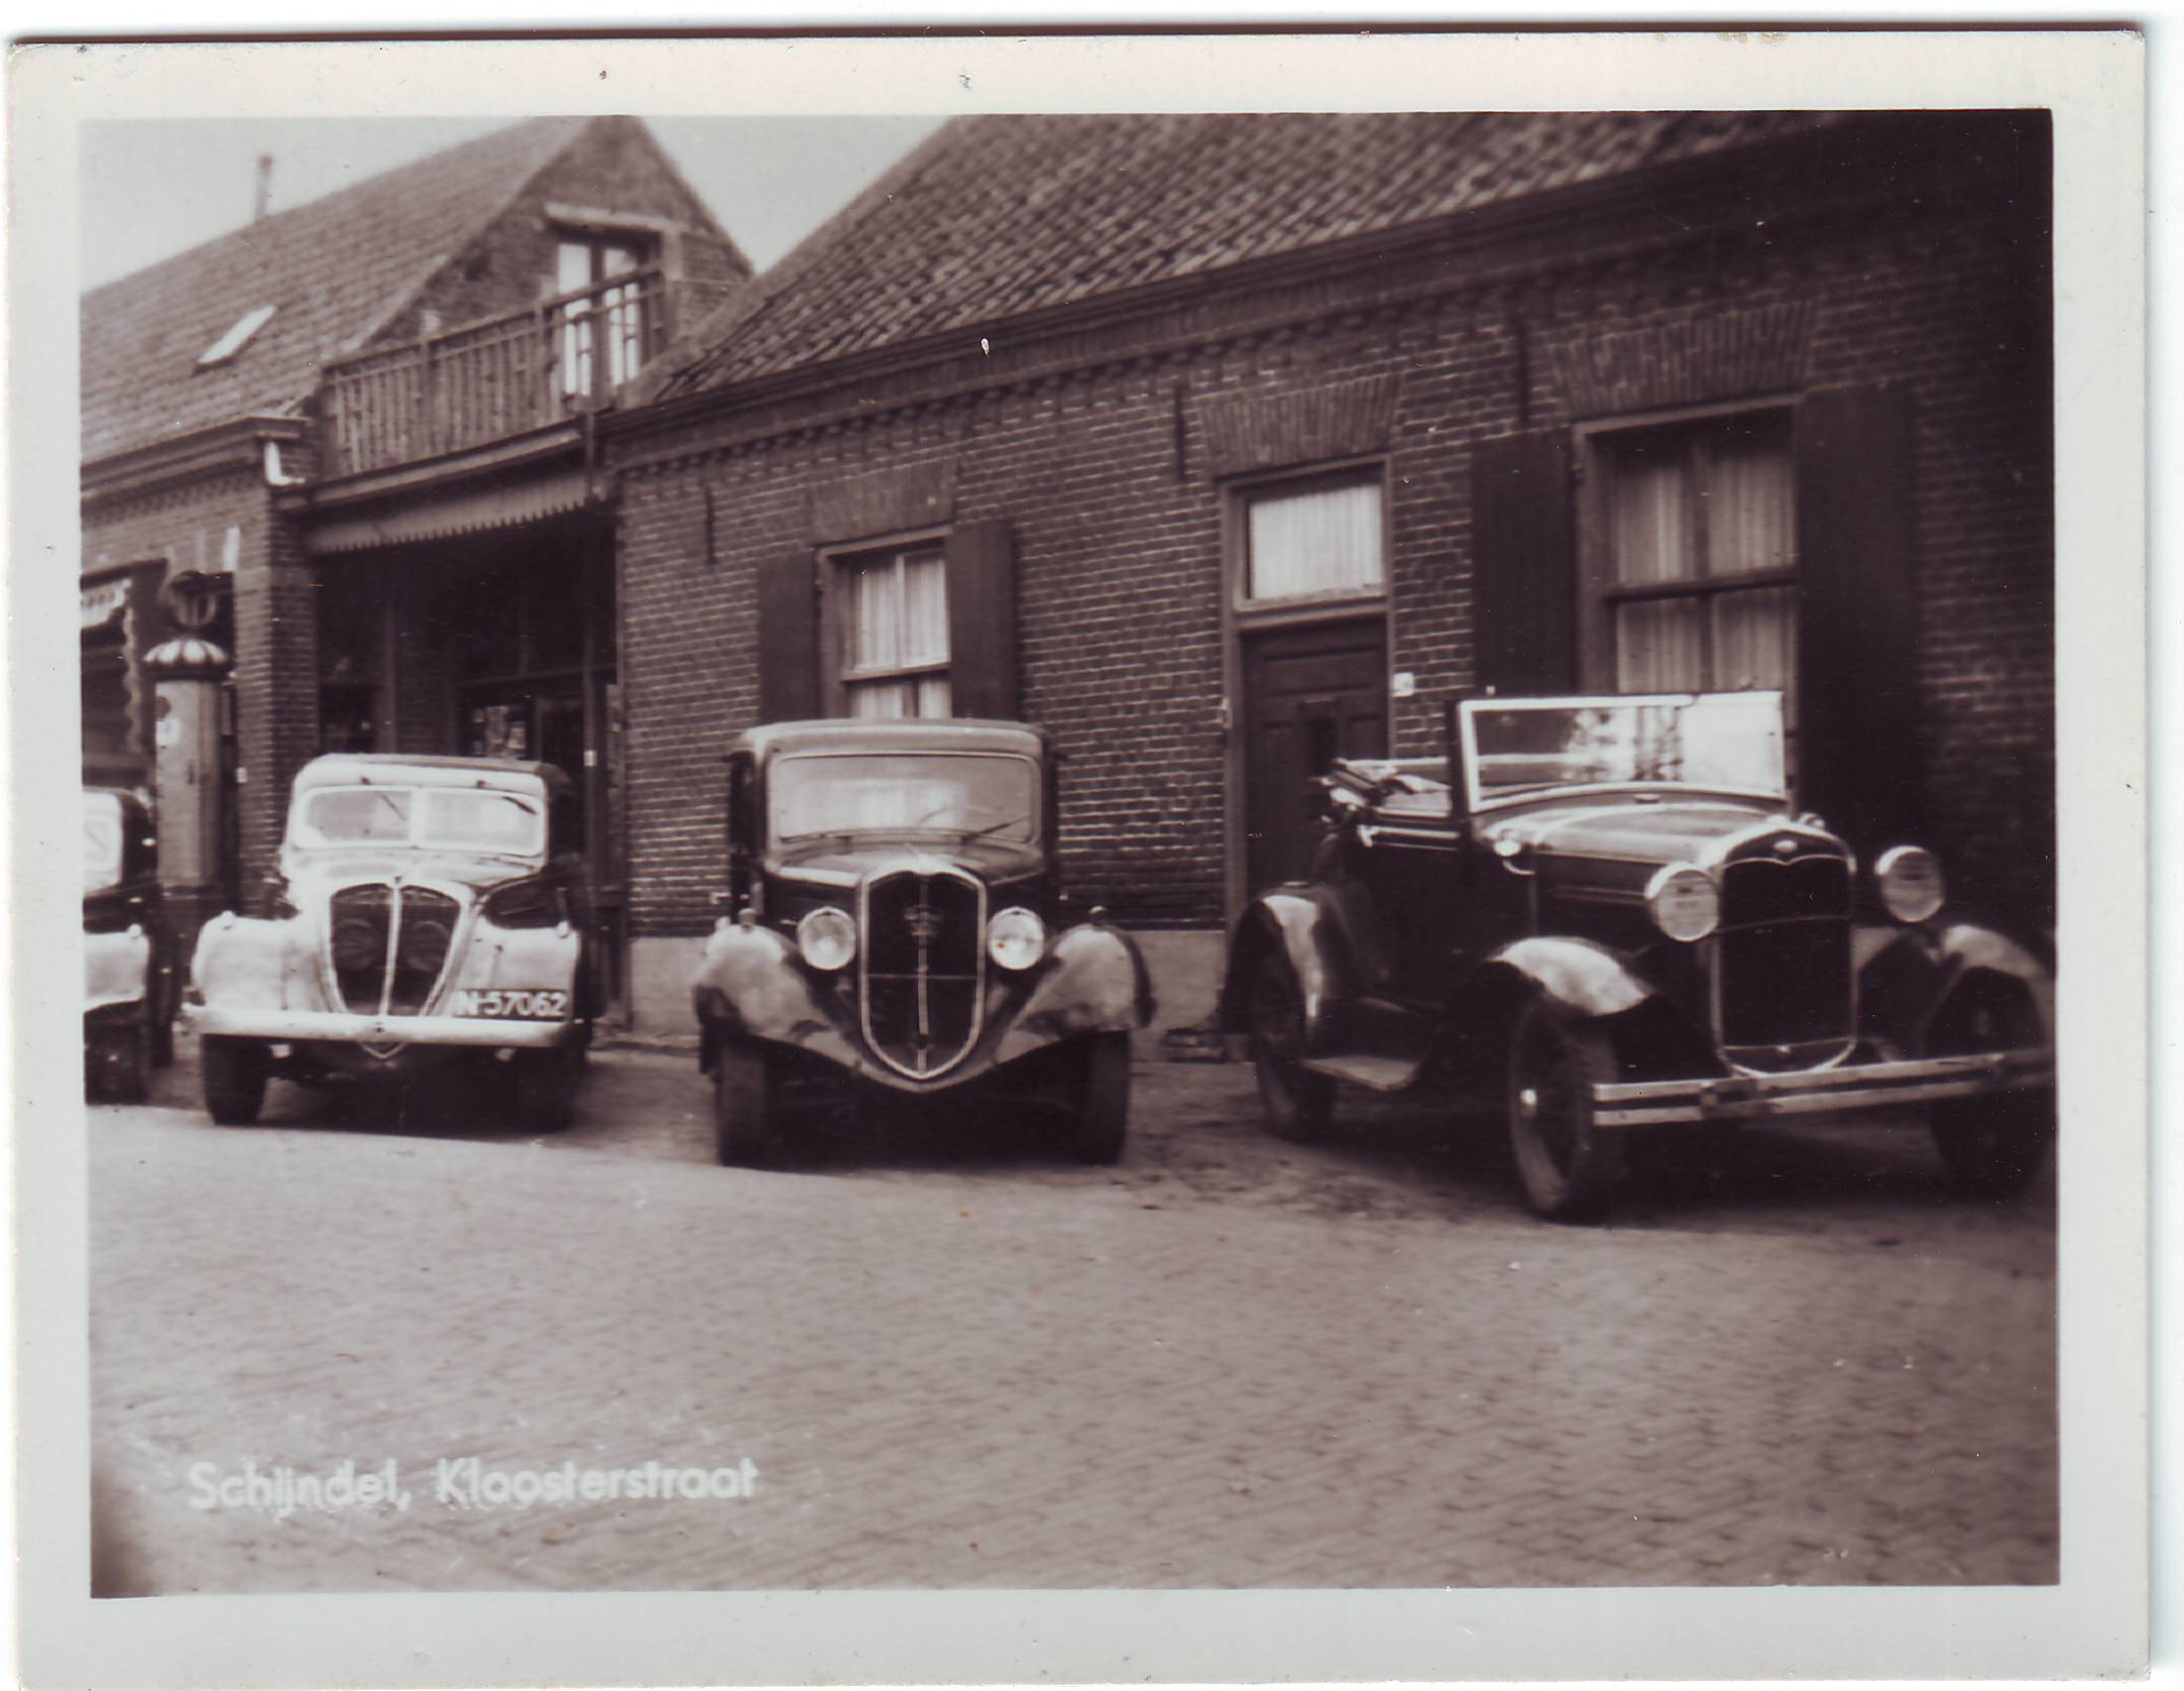 Three cars on a street